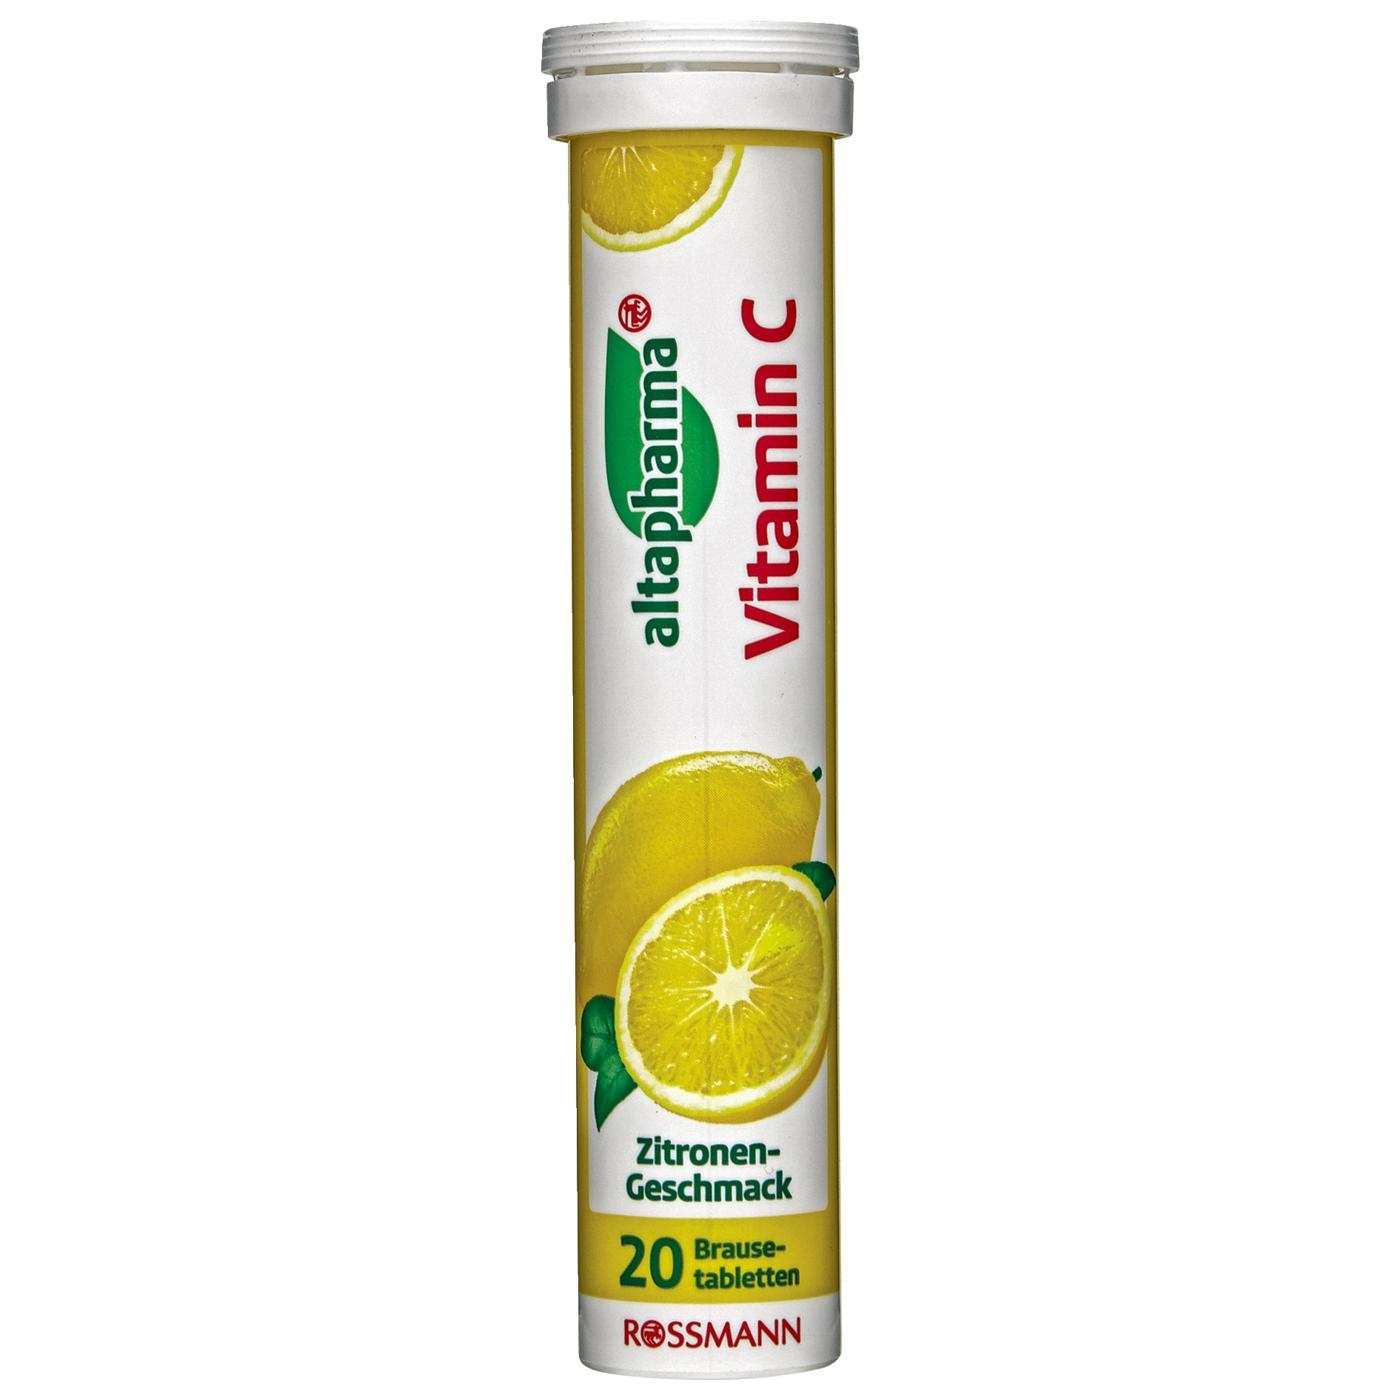 Viên sủi Vitamin C nhập khẩu